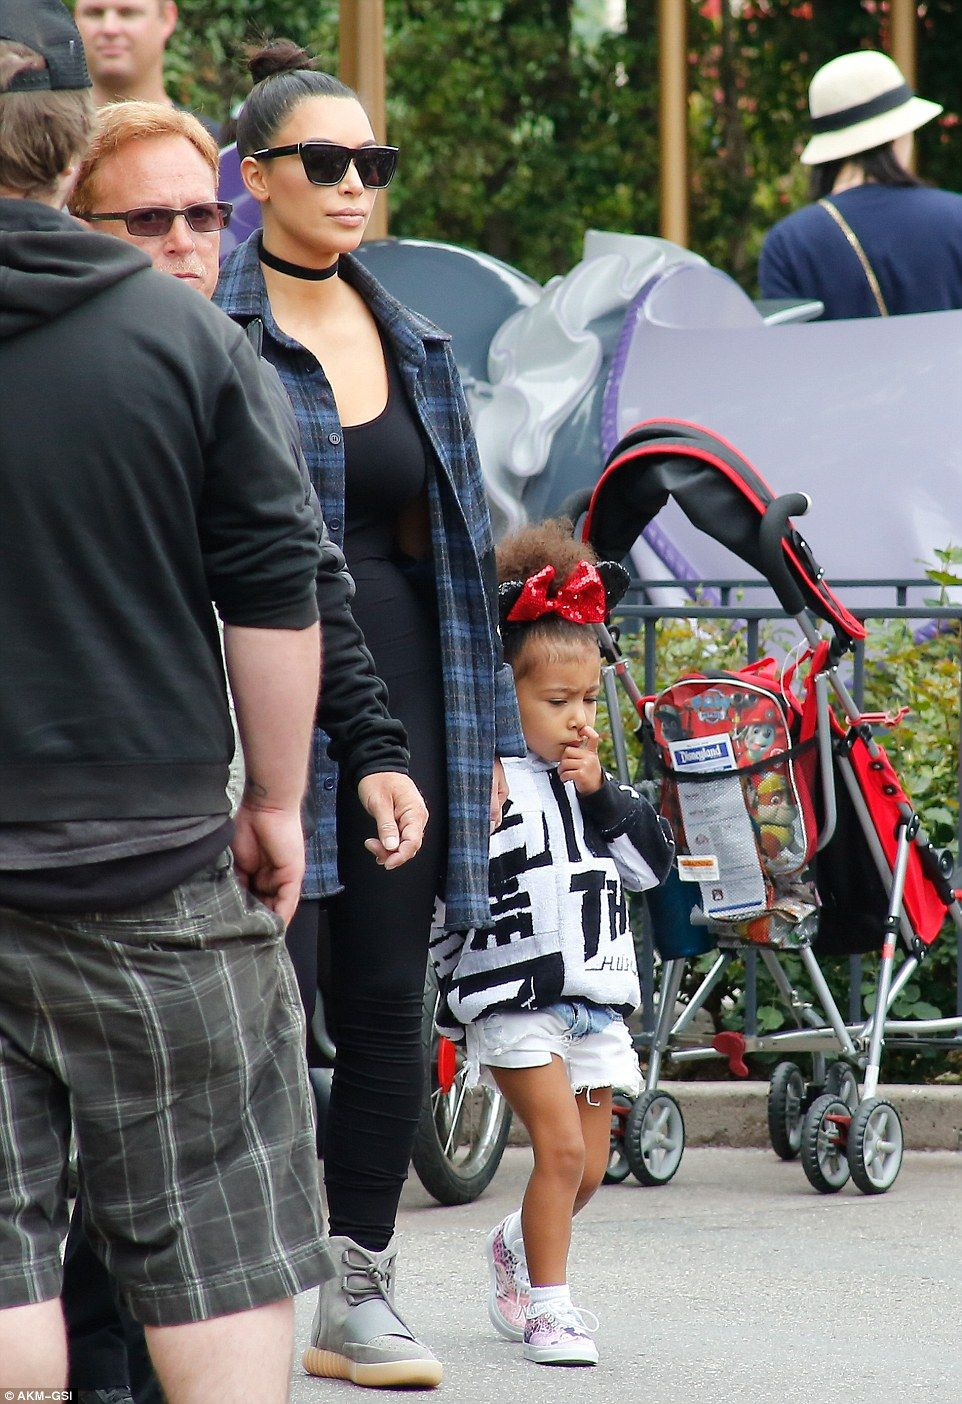 Khloe kardashian flannel shirt  Kim Kardashian enjoys a churro during Disneyland outing  Pinterest